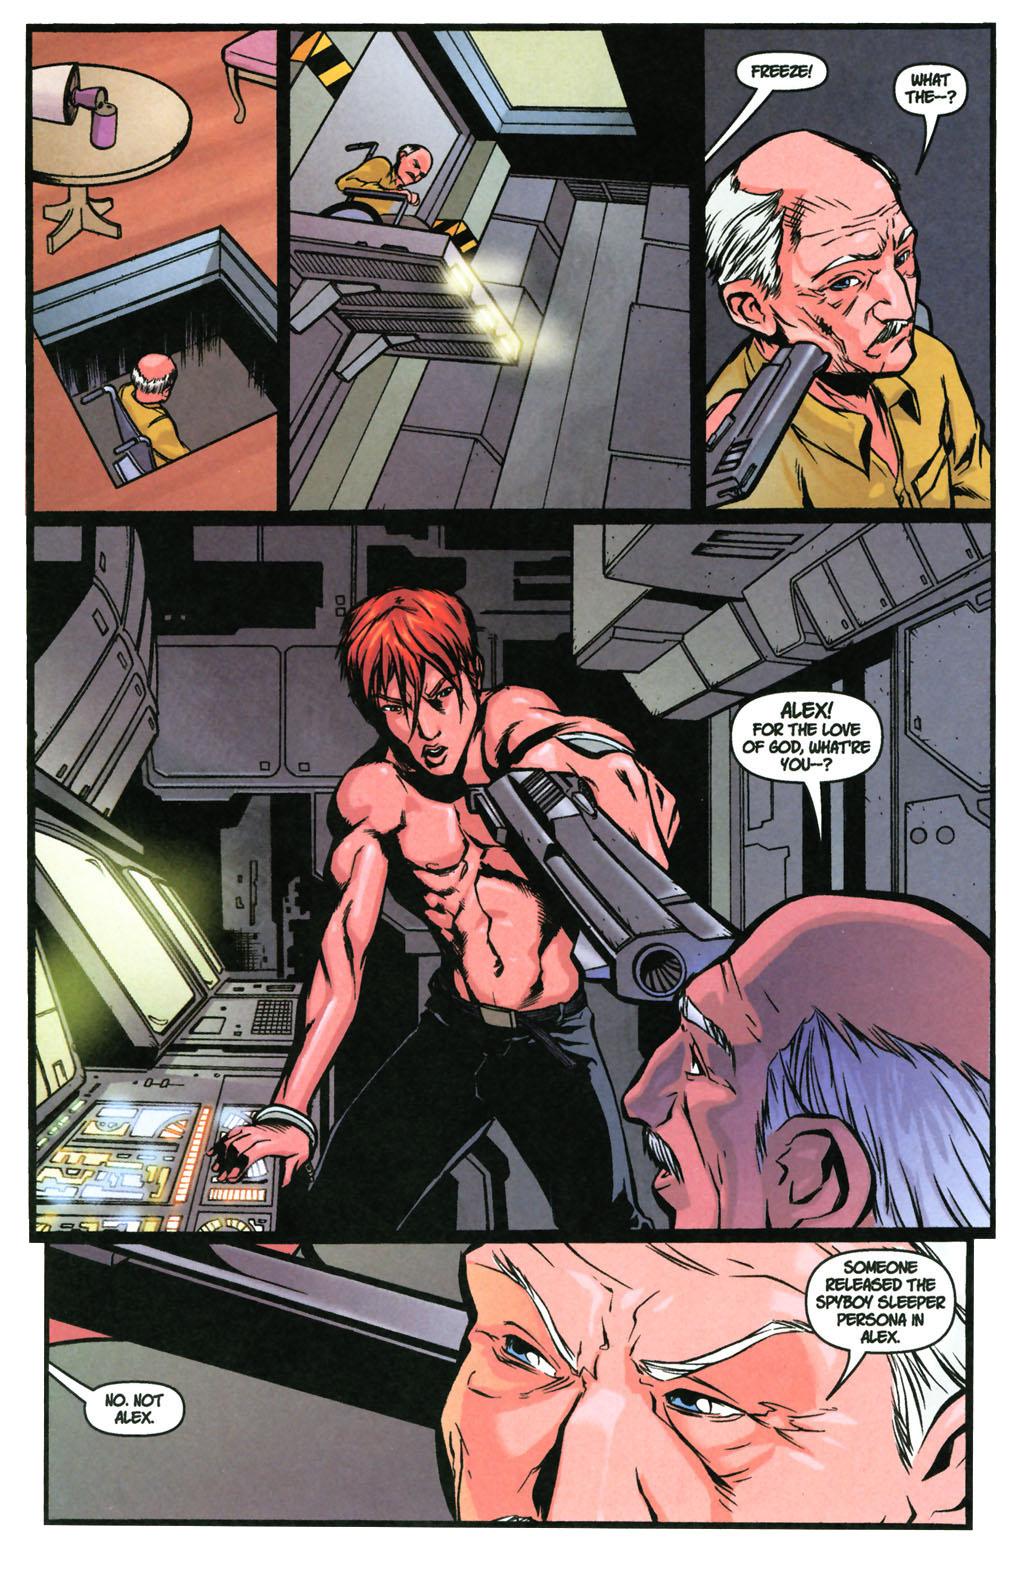 Read online SpyBoy: Final Exam comic -  Issue #3 - 14